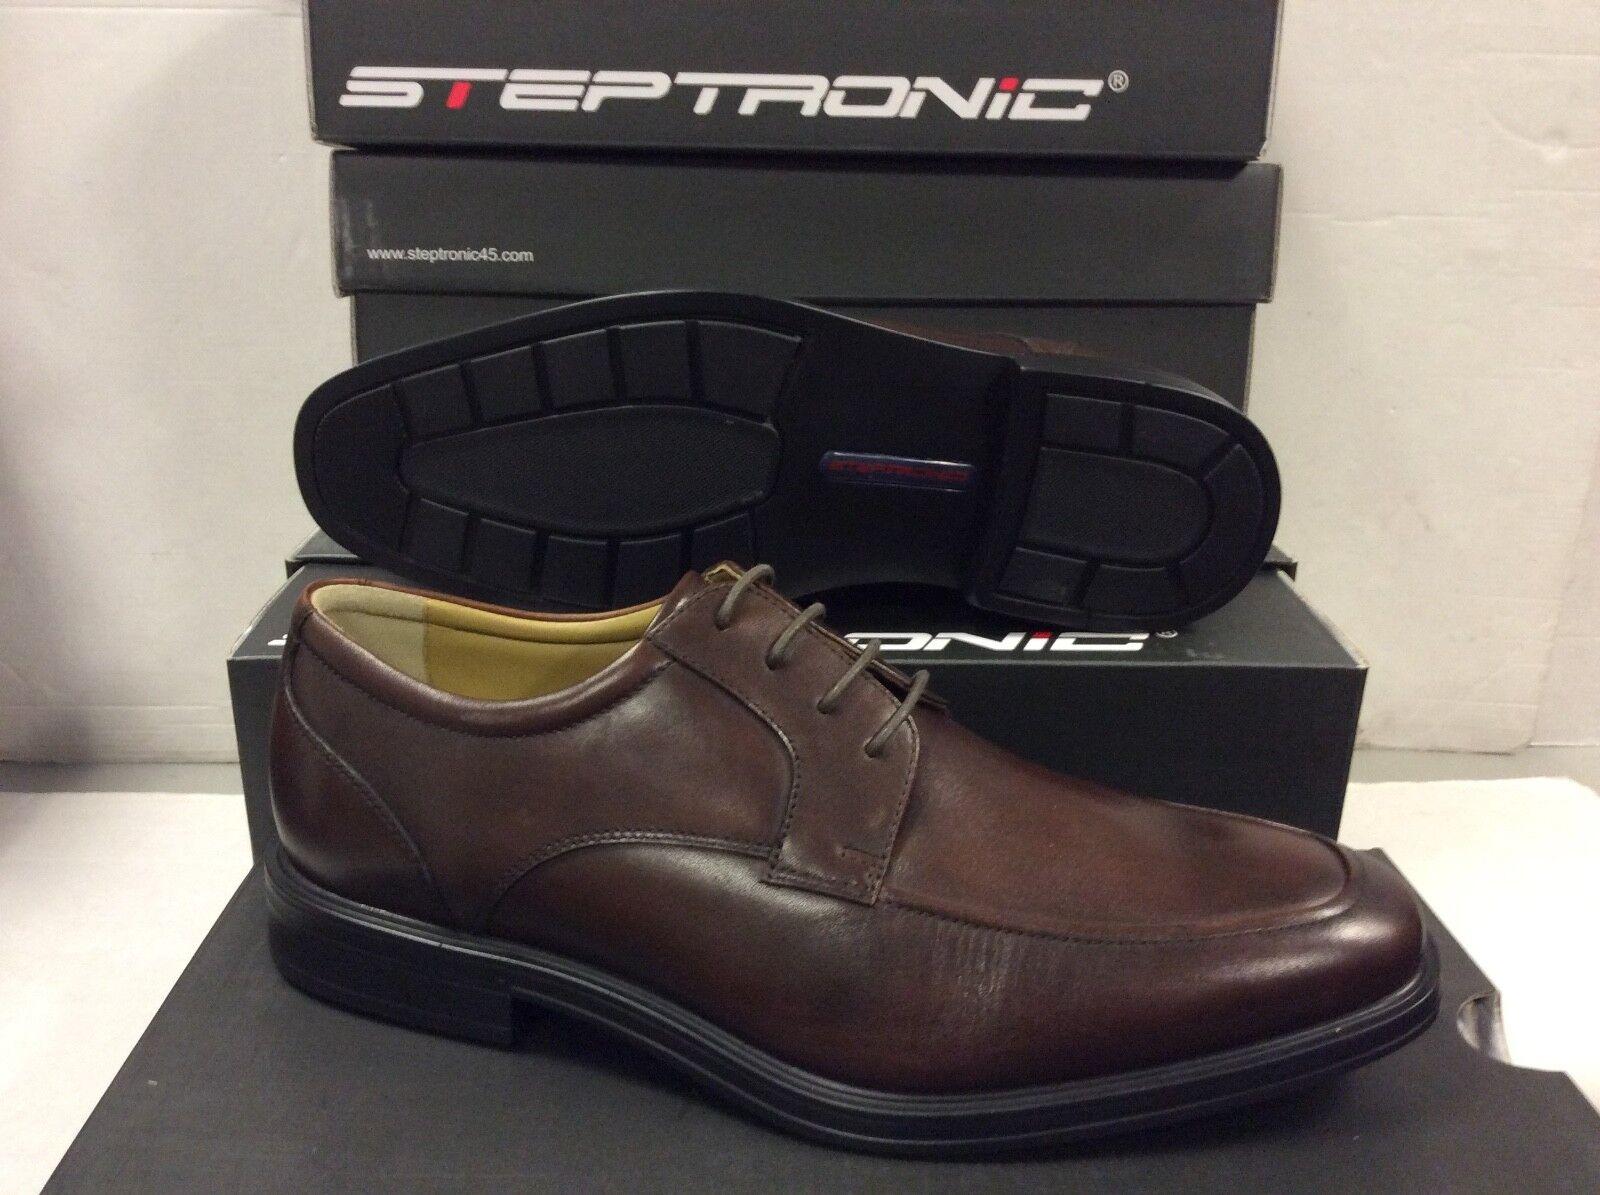 Steptronic Con Cordones Cuero Marrón Profundo Encerado Para hombre Zapatos, Talla  42 euros